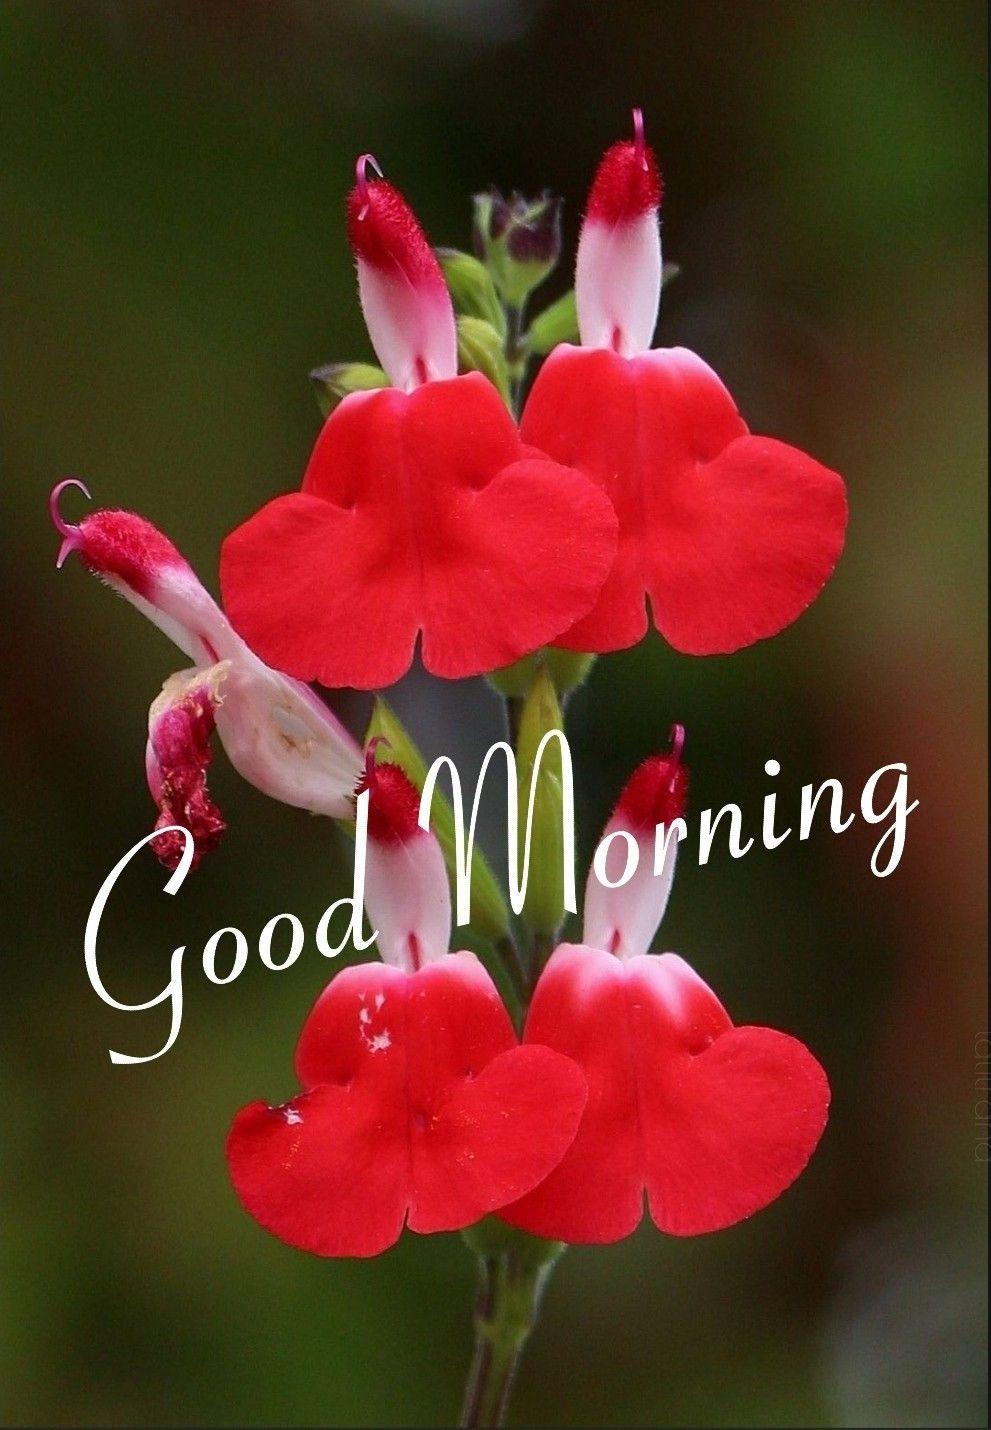 Pin By Lara On Morning Wishes Good Morning Beautiful Pictures Good Morning Wishes Good Morning Beautiful